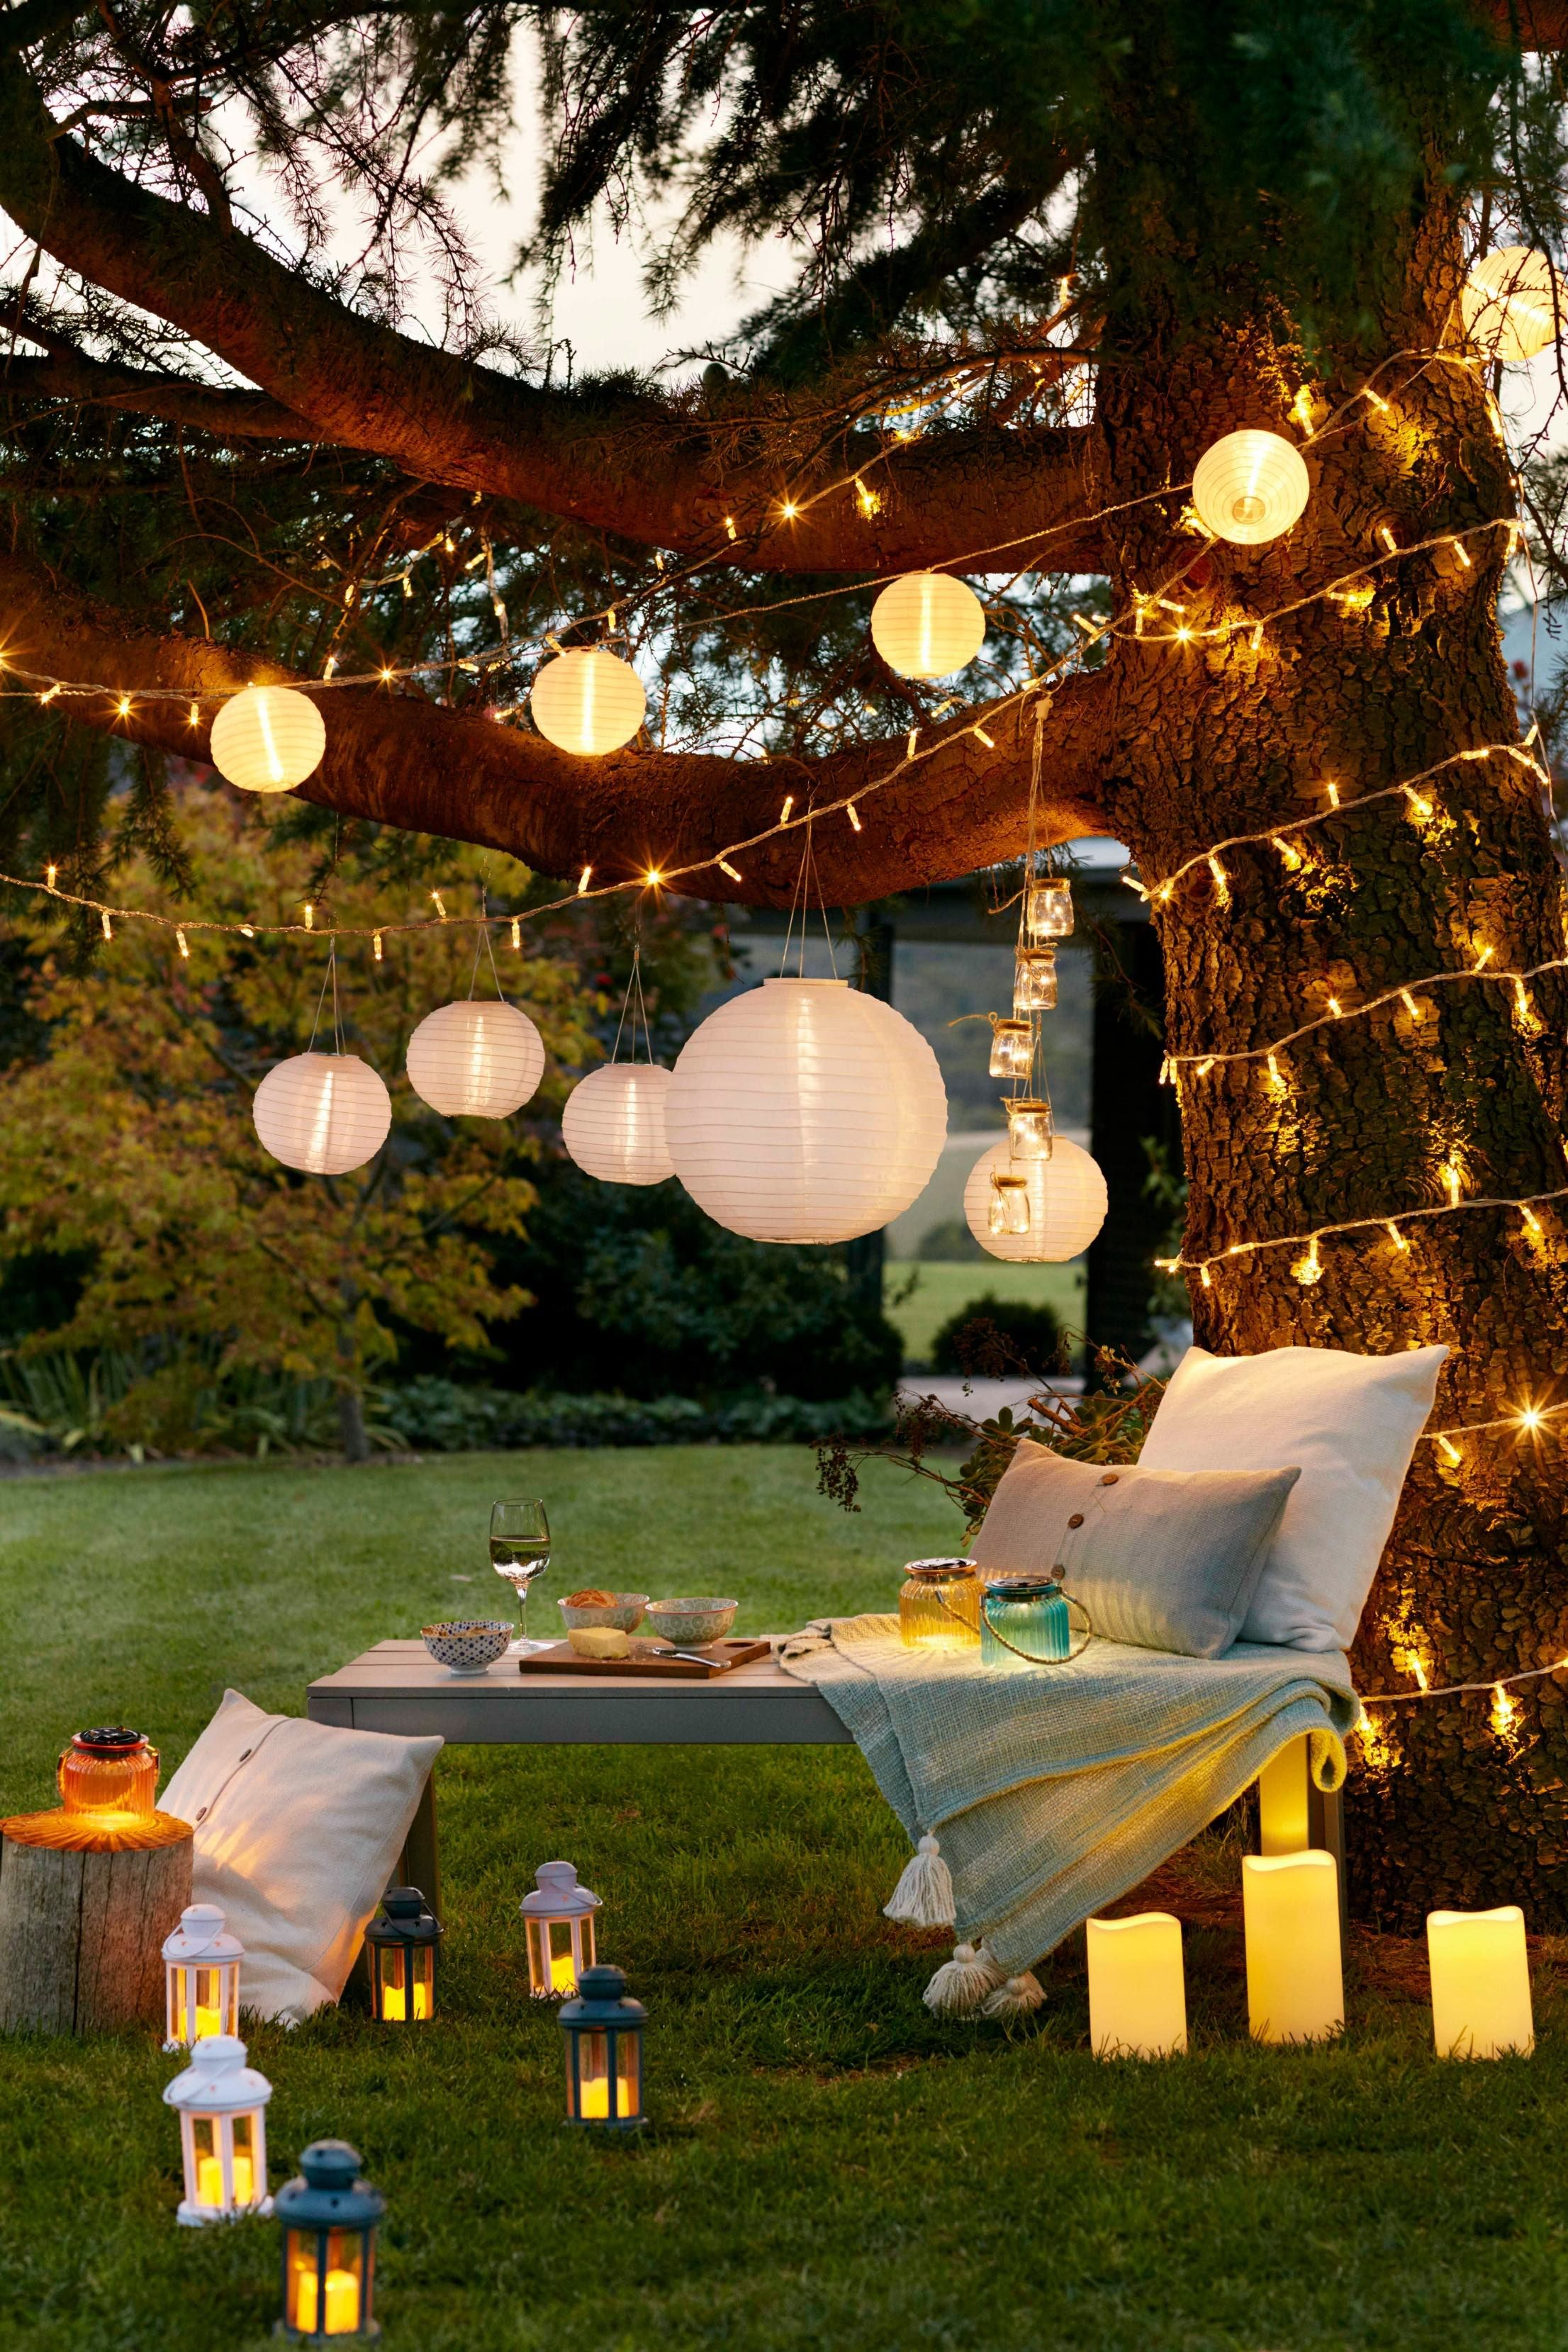 10 Ideas For The Perfect Summer Party Outdoor Garden Lighting Solar Lights Garden Backyard Lighting